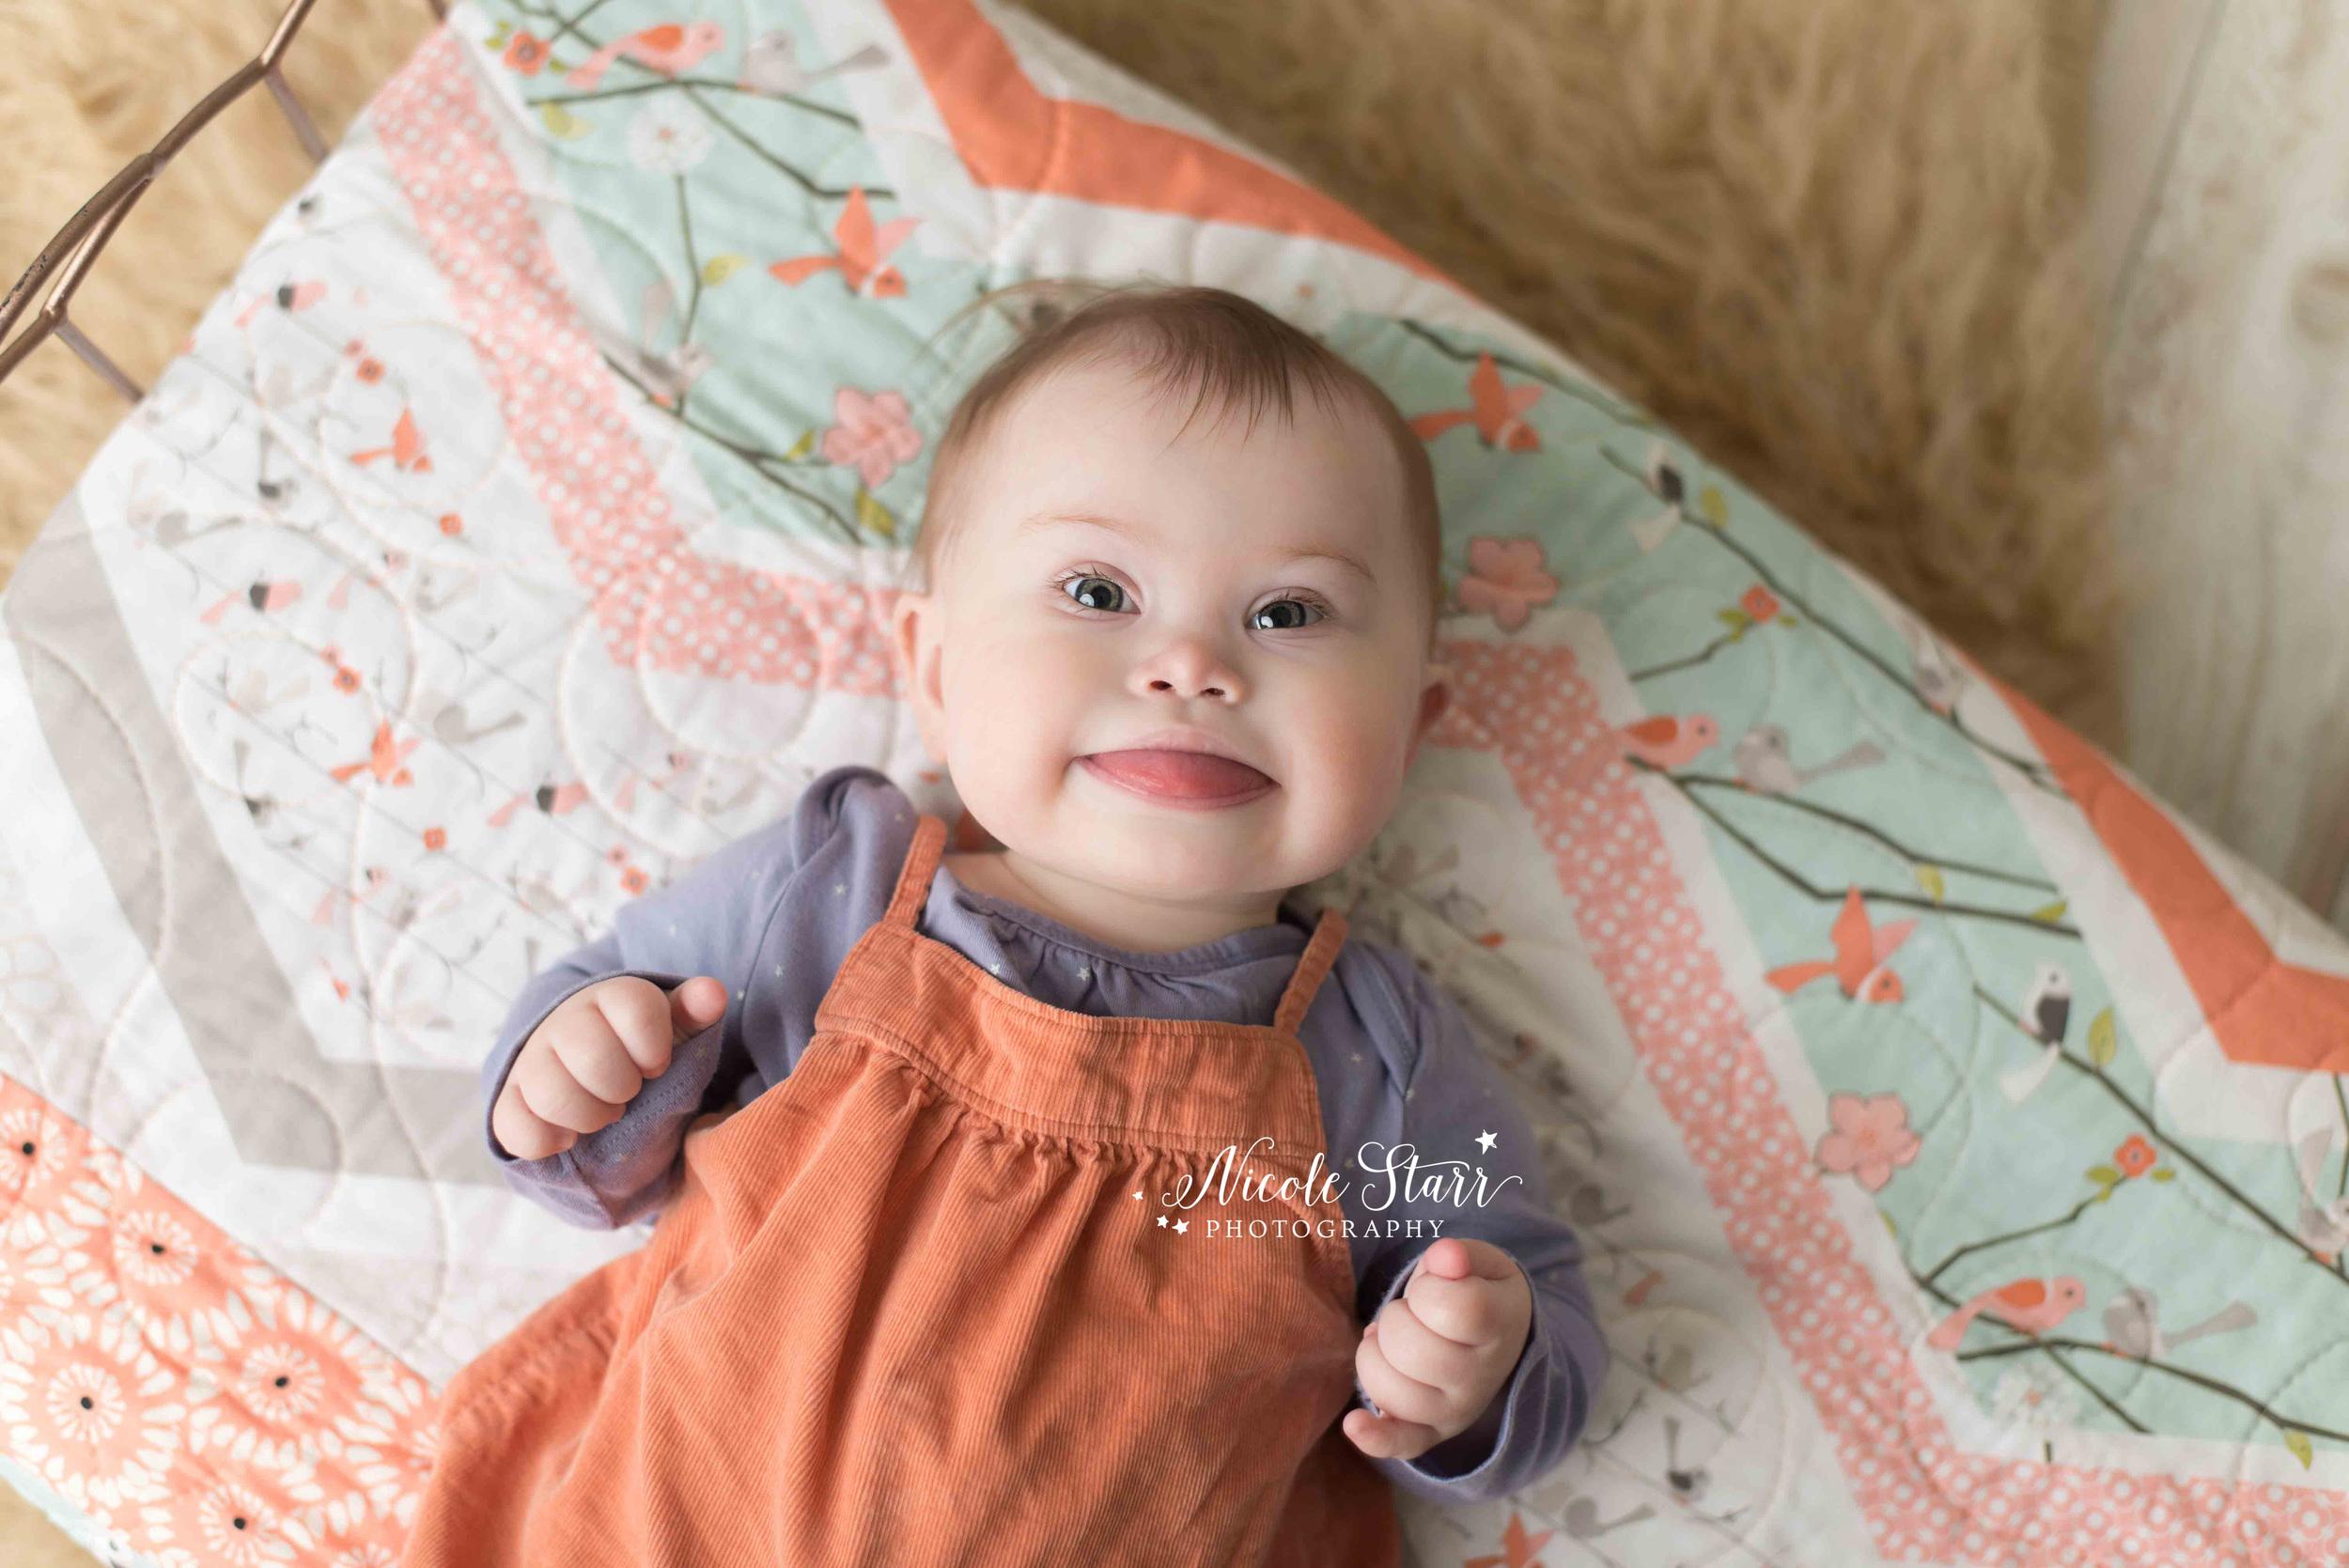 saratoga albany baby photographer 2.jpg